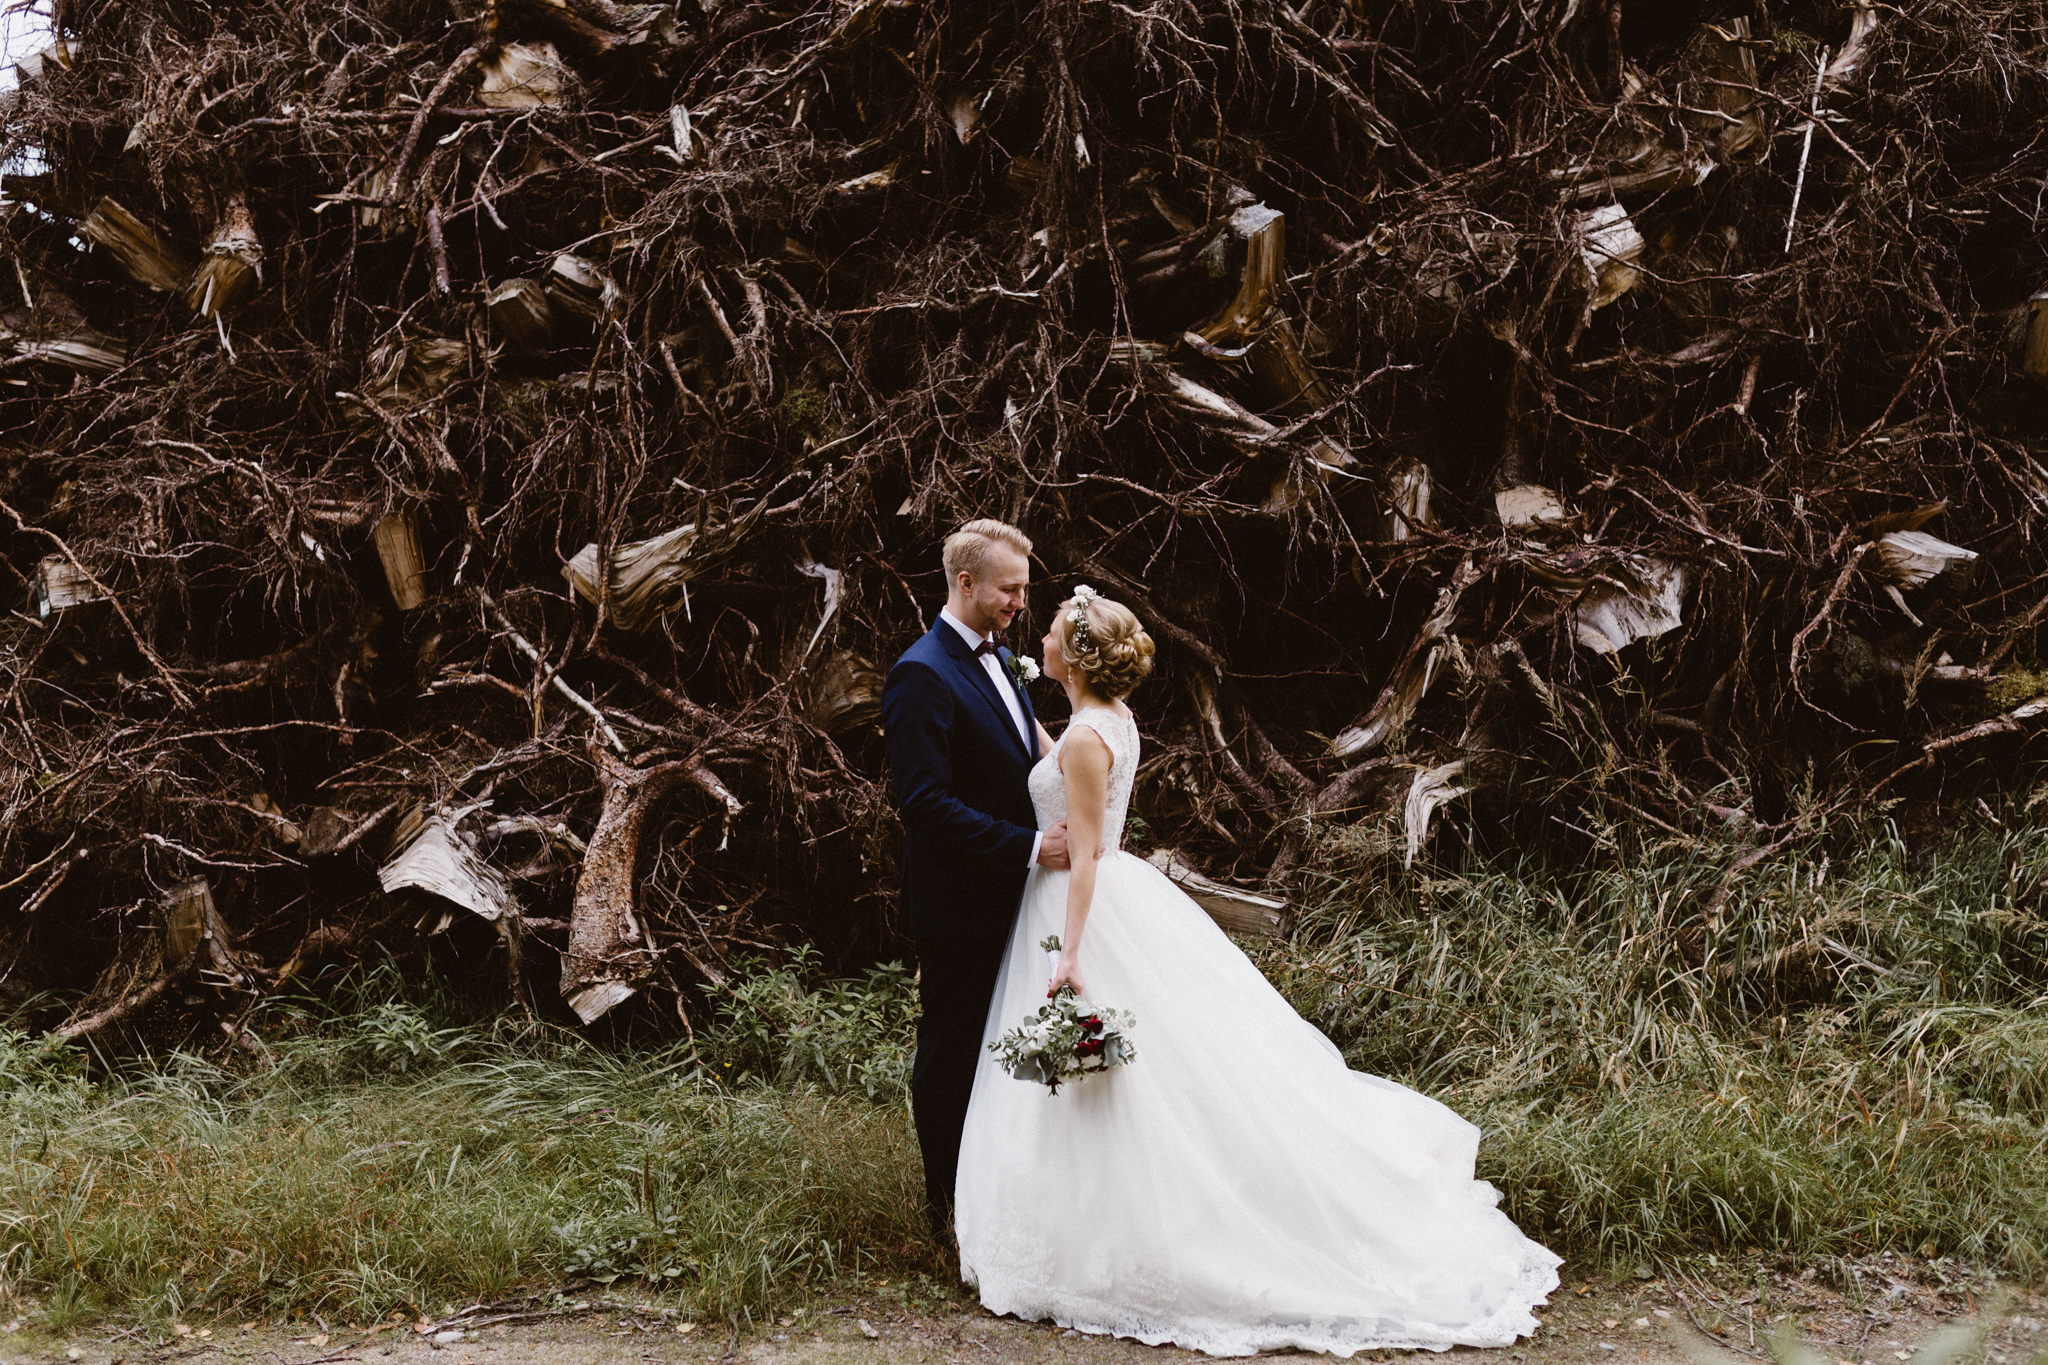 Leevi + Susanna -- Patrick Karkkolainen Wedding Photographer-337.jpg